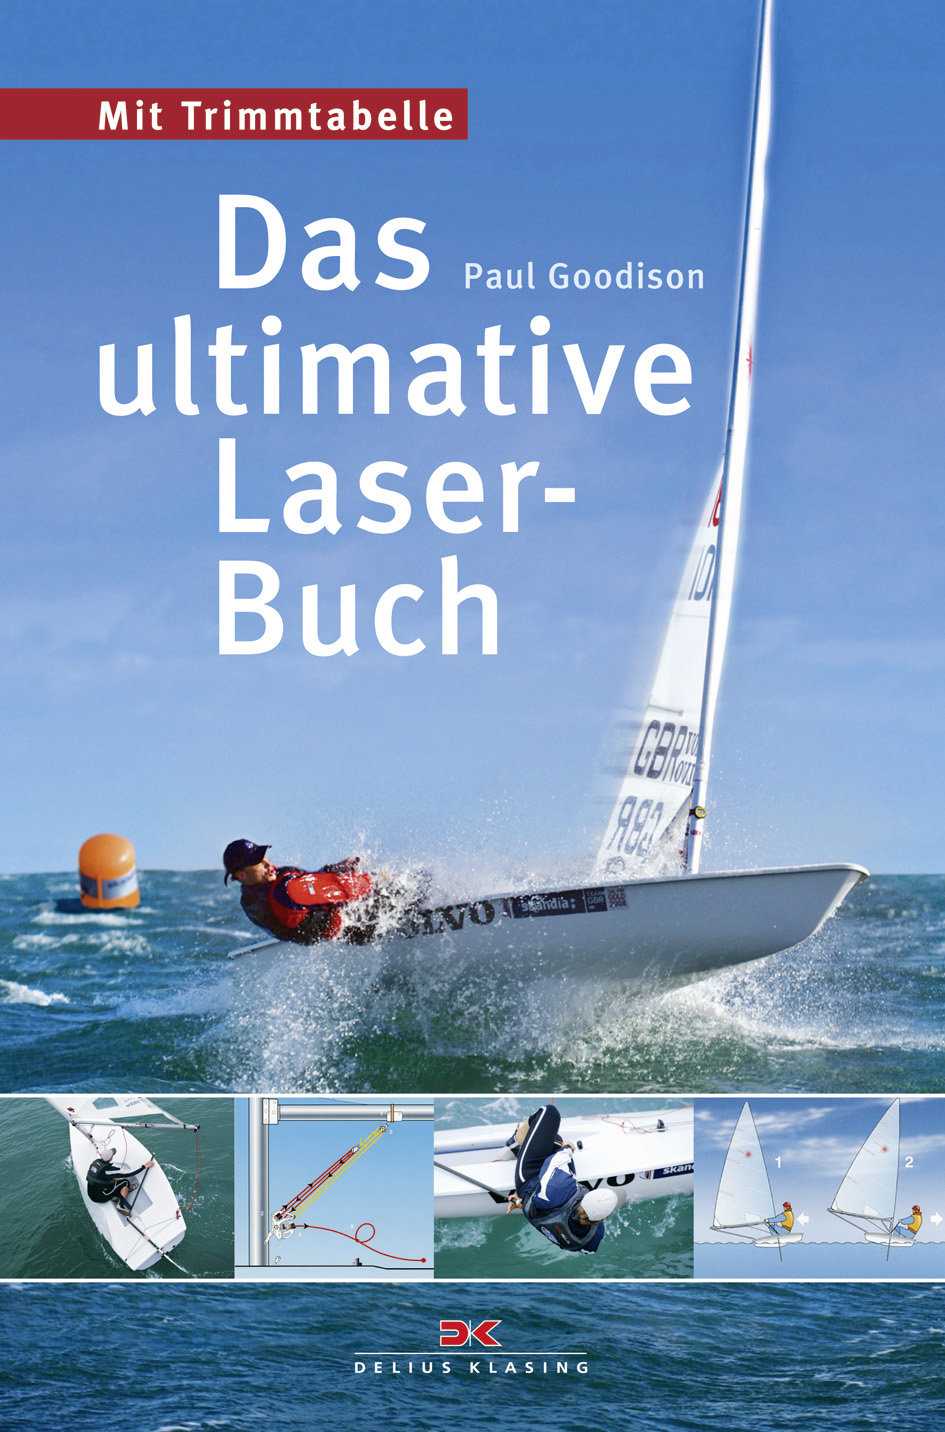 Das ultimative Laser-Buch: Mit Trimmtabelle - Paul Goodison